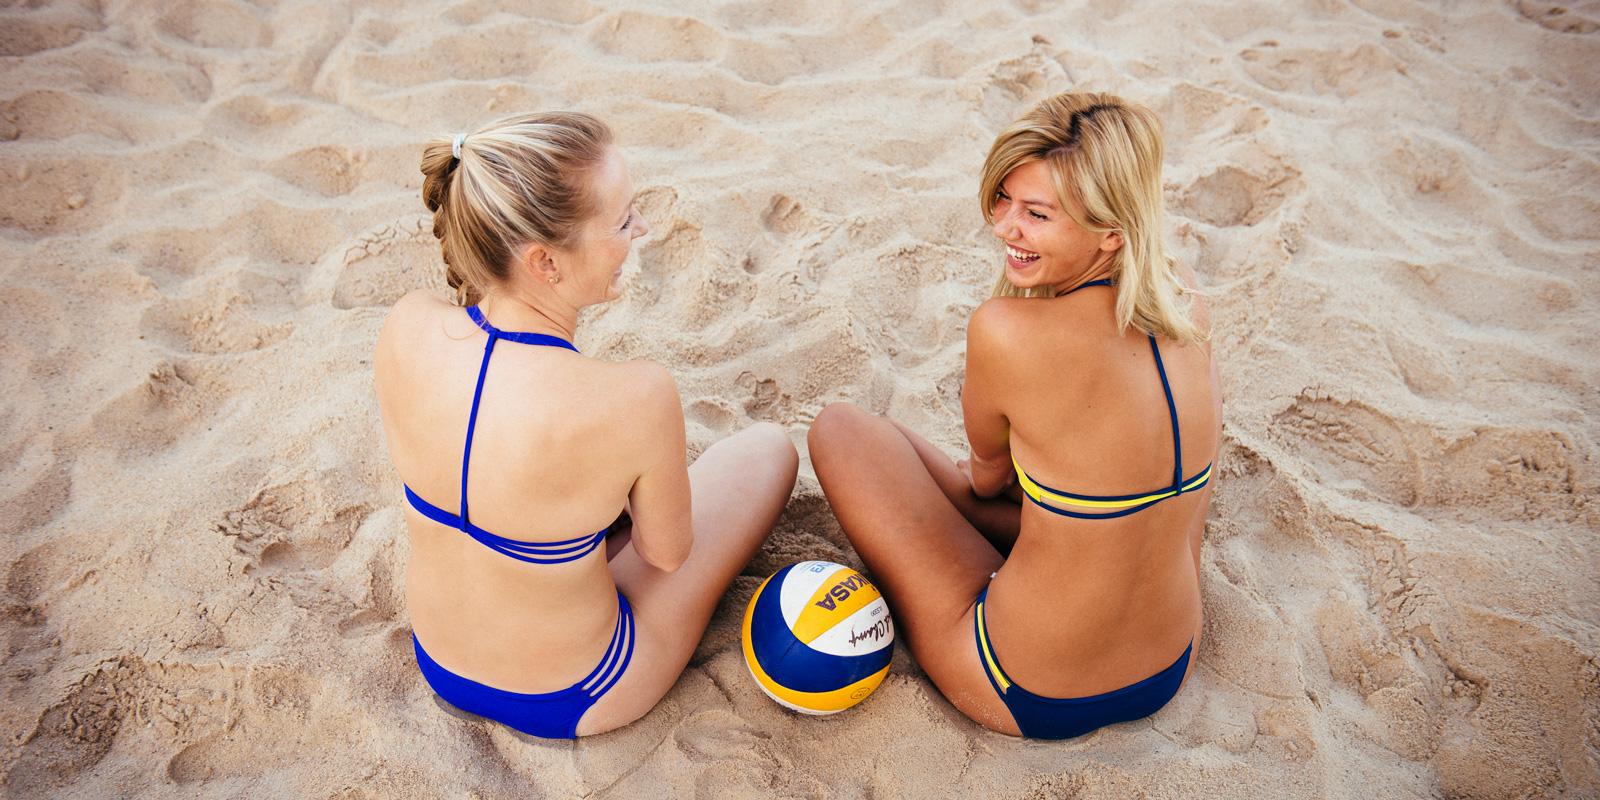 INASKA Swimwear – The Environmentally Friendly Bikini That Grips